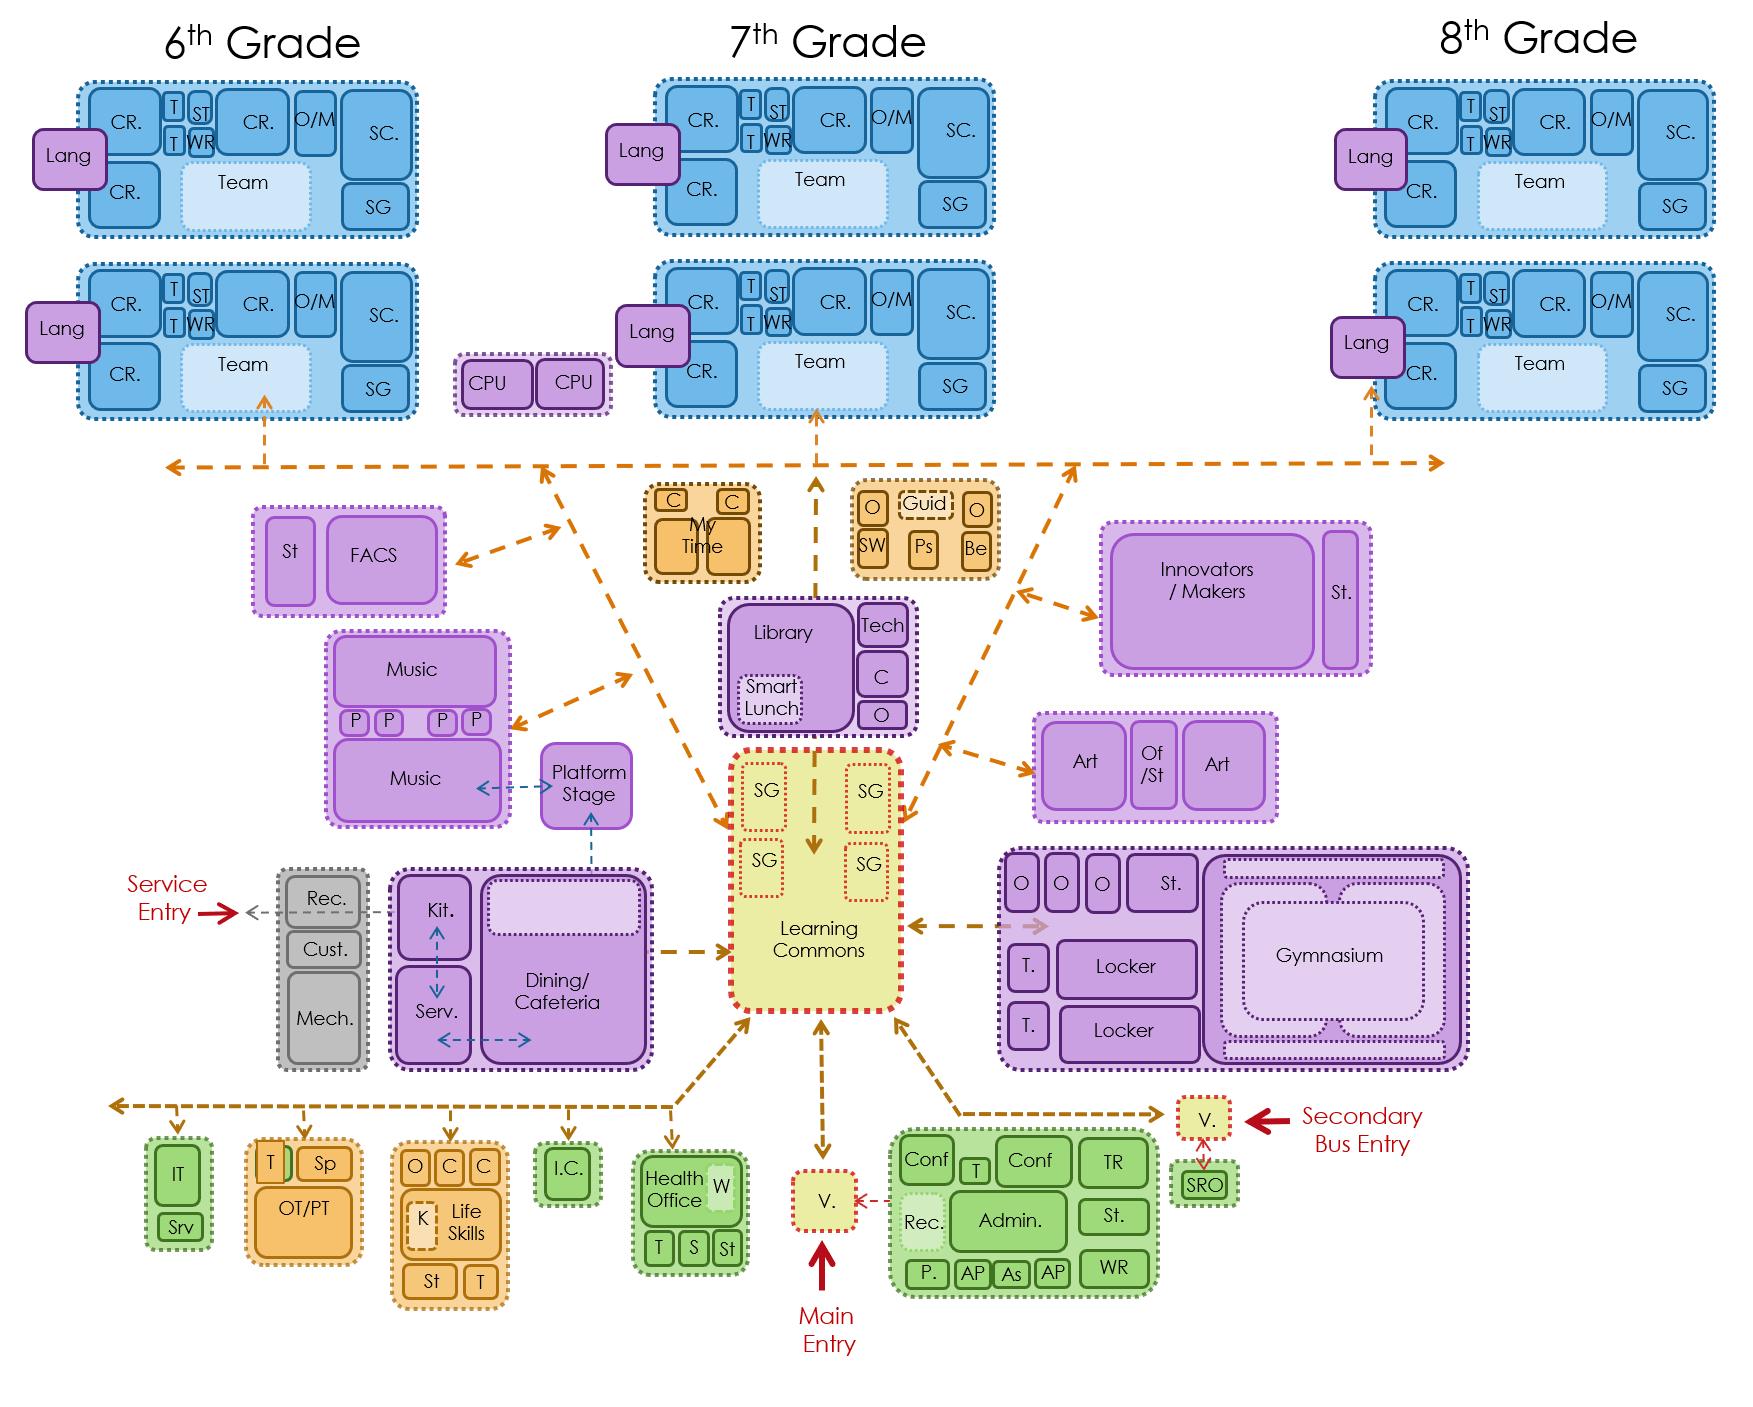 Clark/Wilkins Organizational Diagram